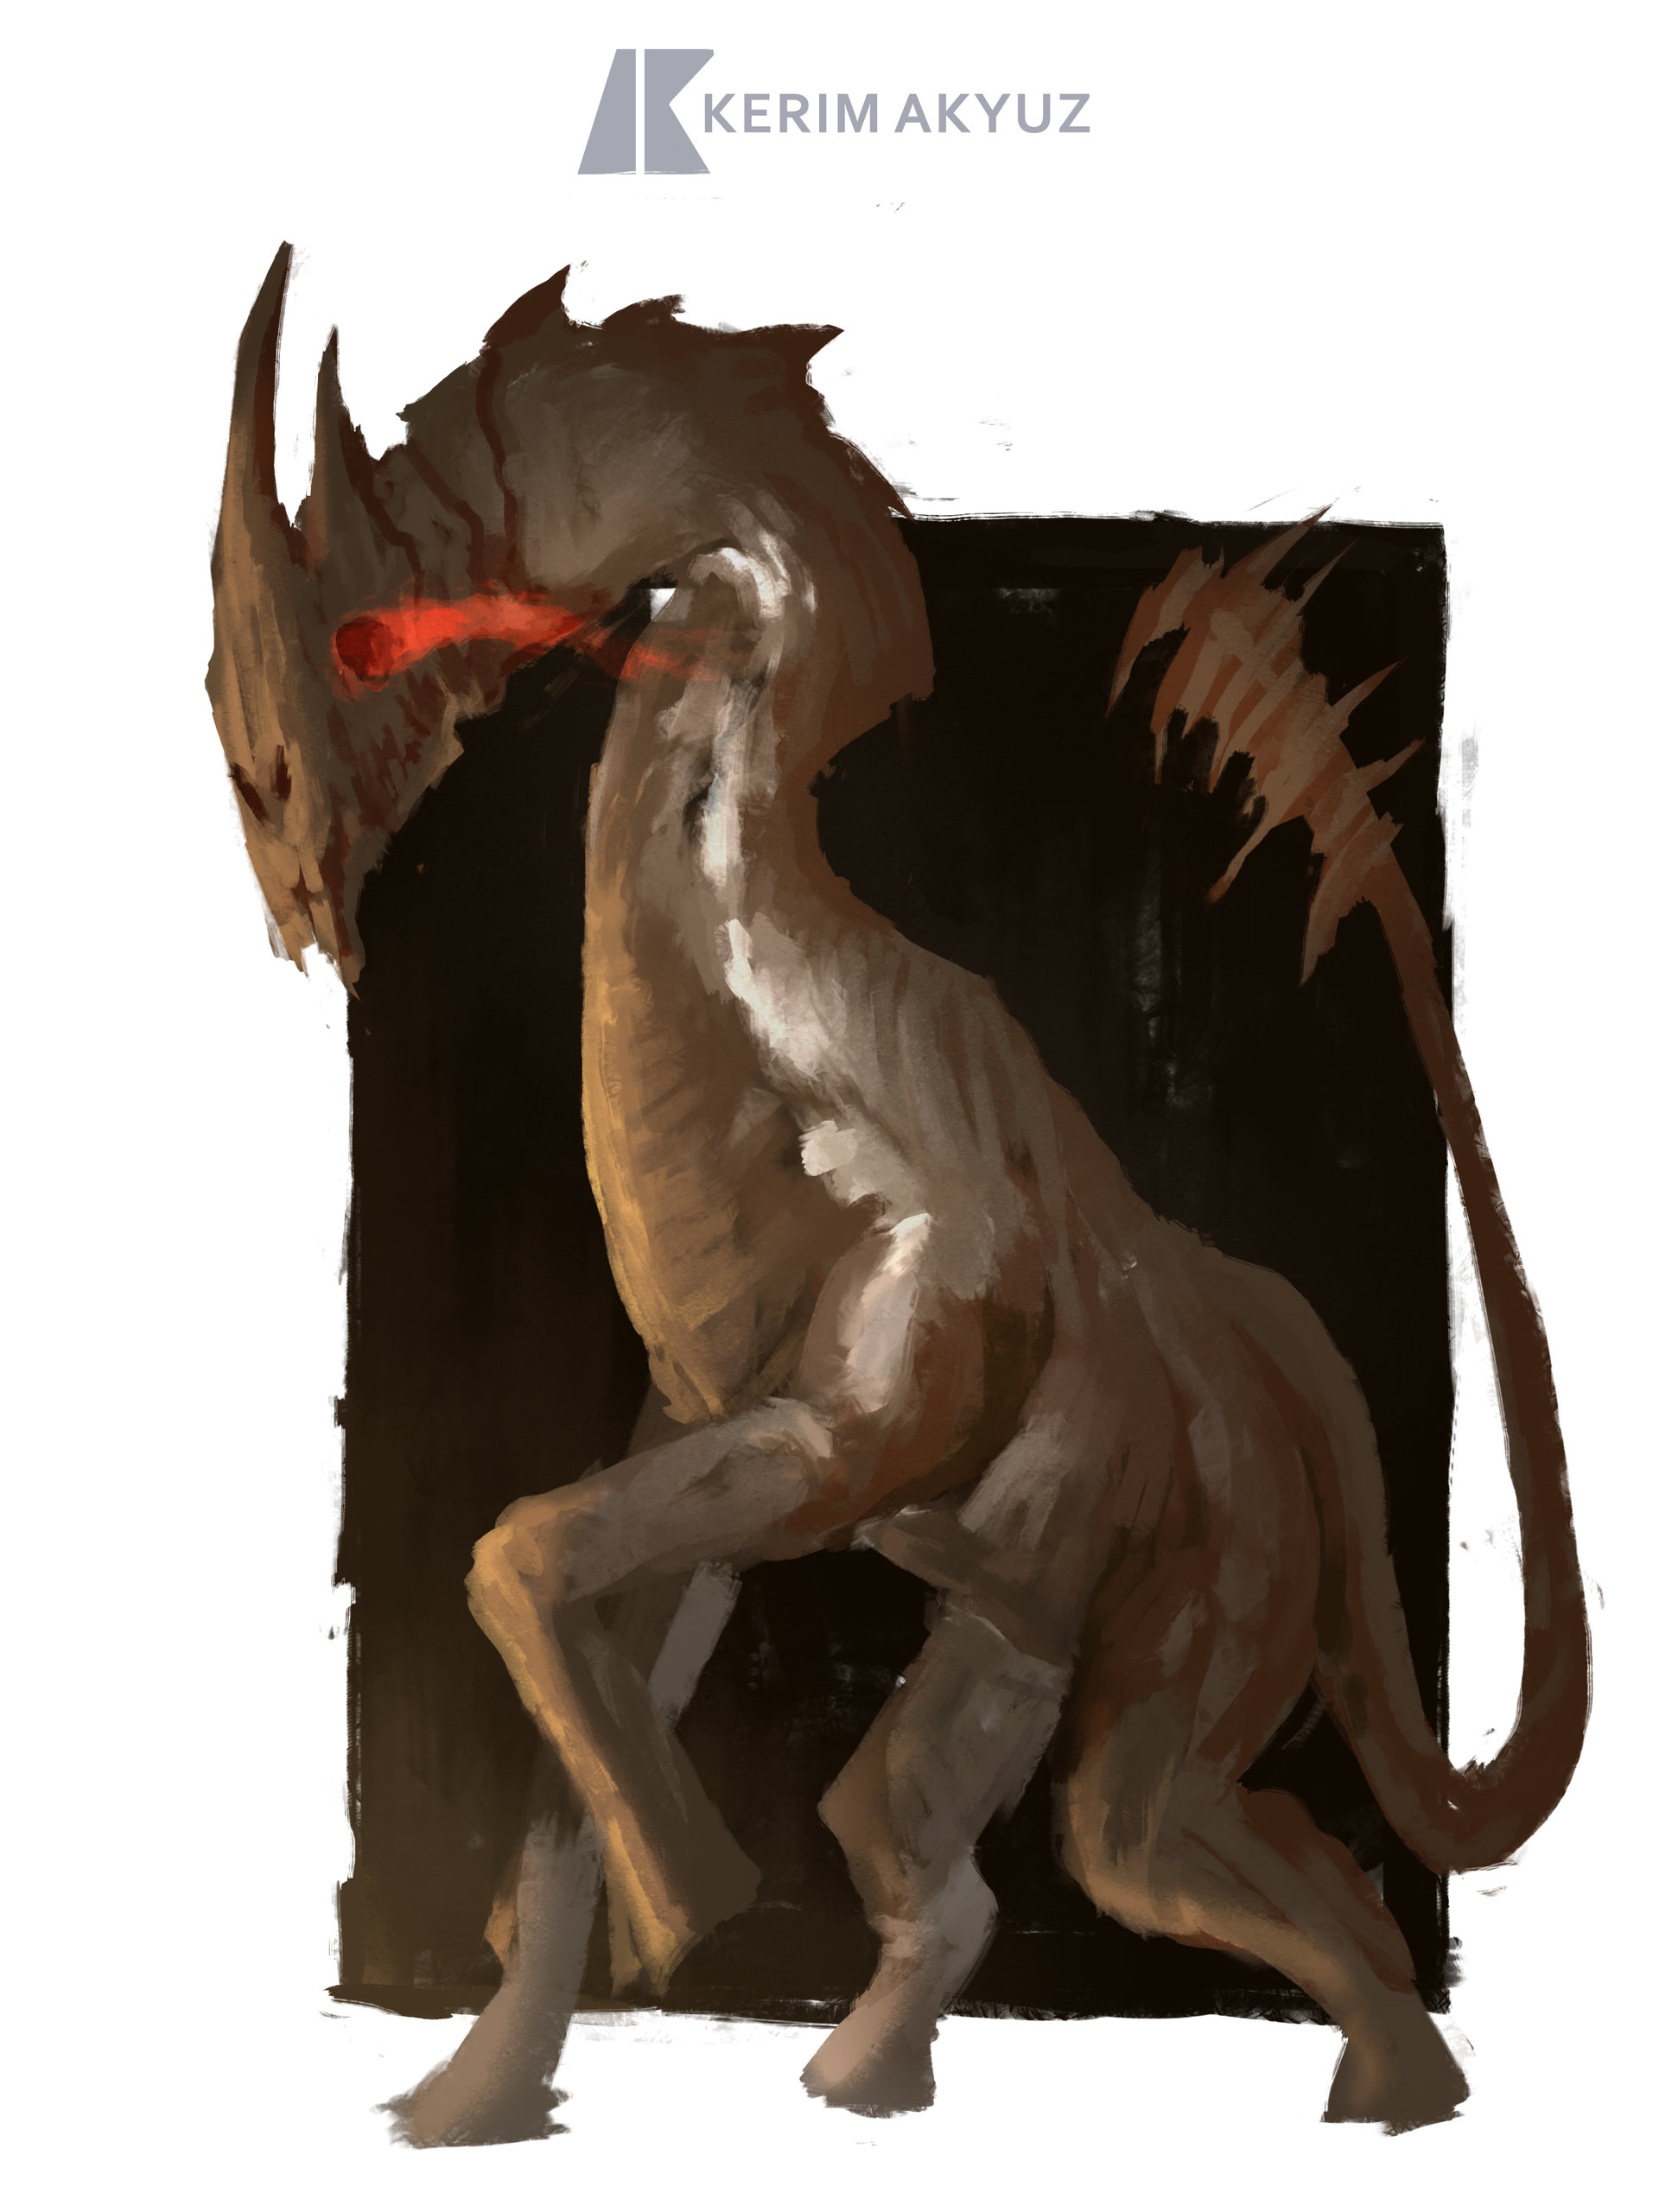 Kerim akyuz 3 bloodhorse